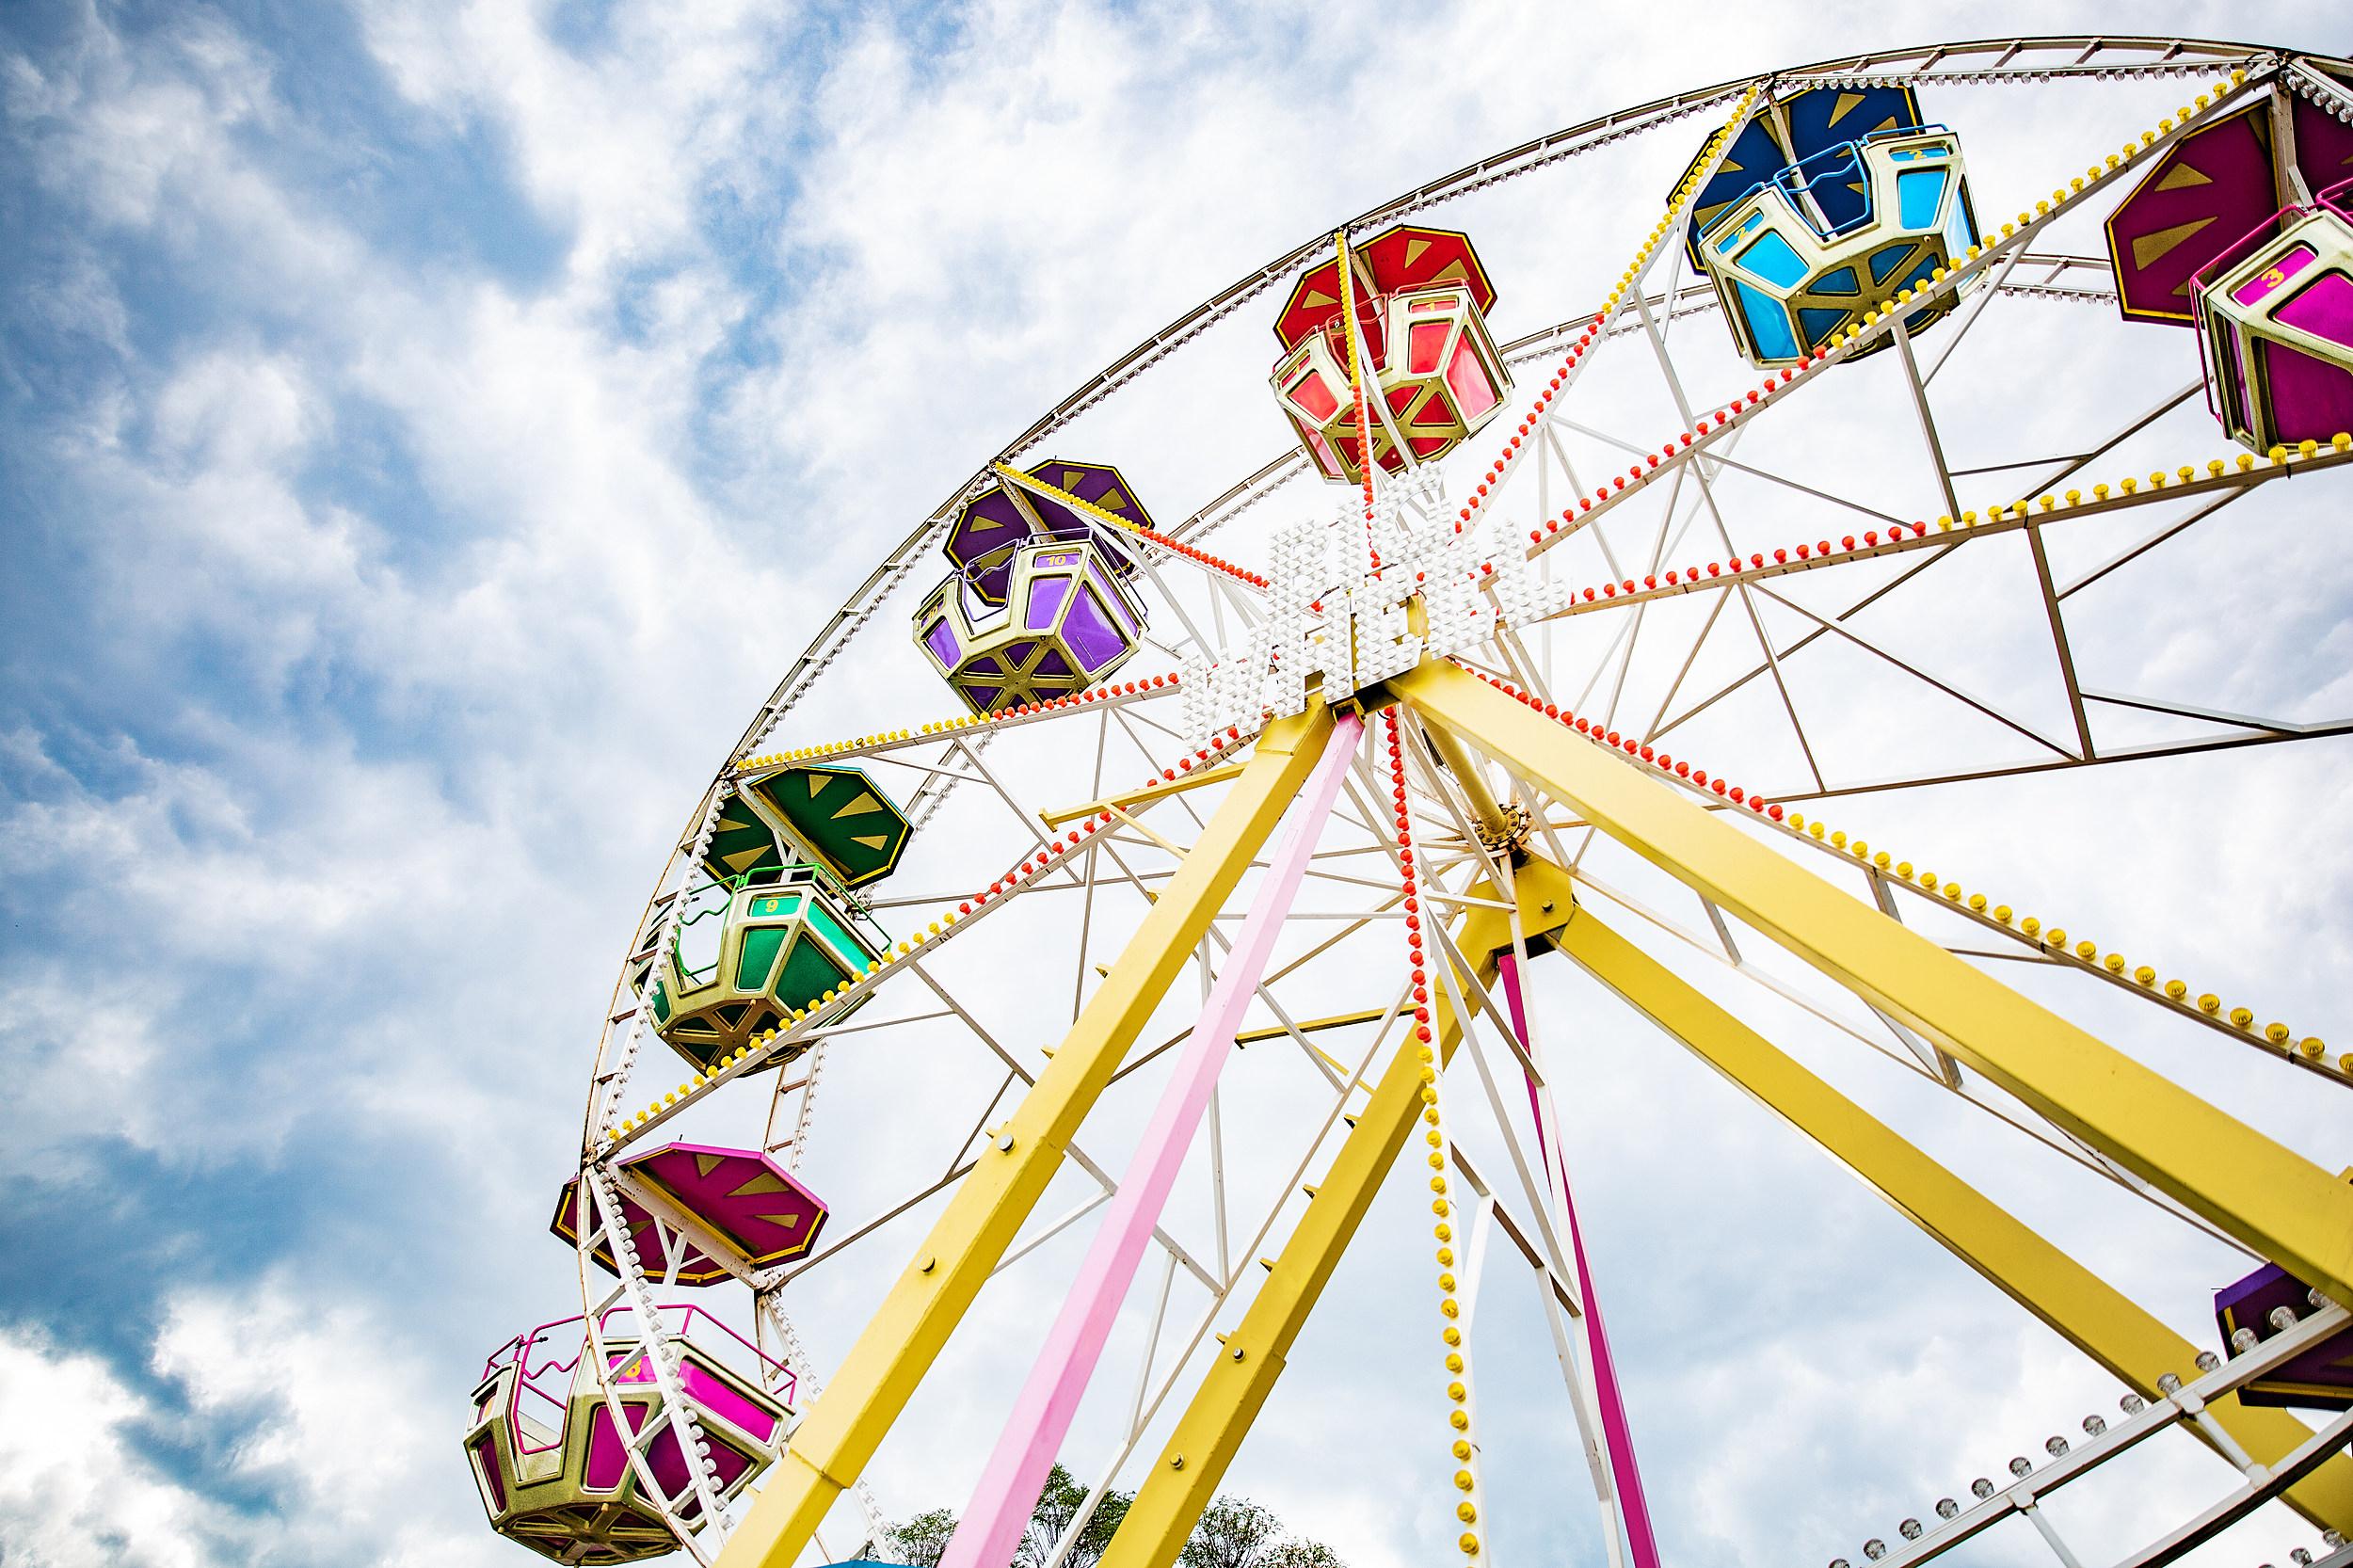 Dutchess County Fair Canceled For 2020 Regarding Dutchess County Fair Ground 2021 Calendar